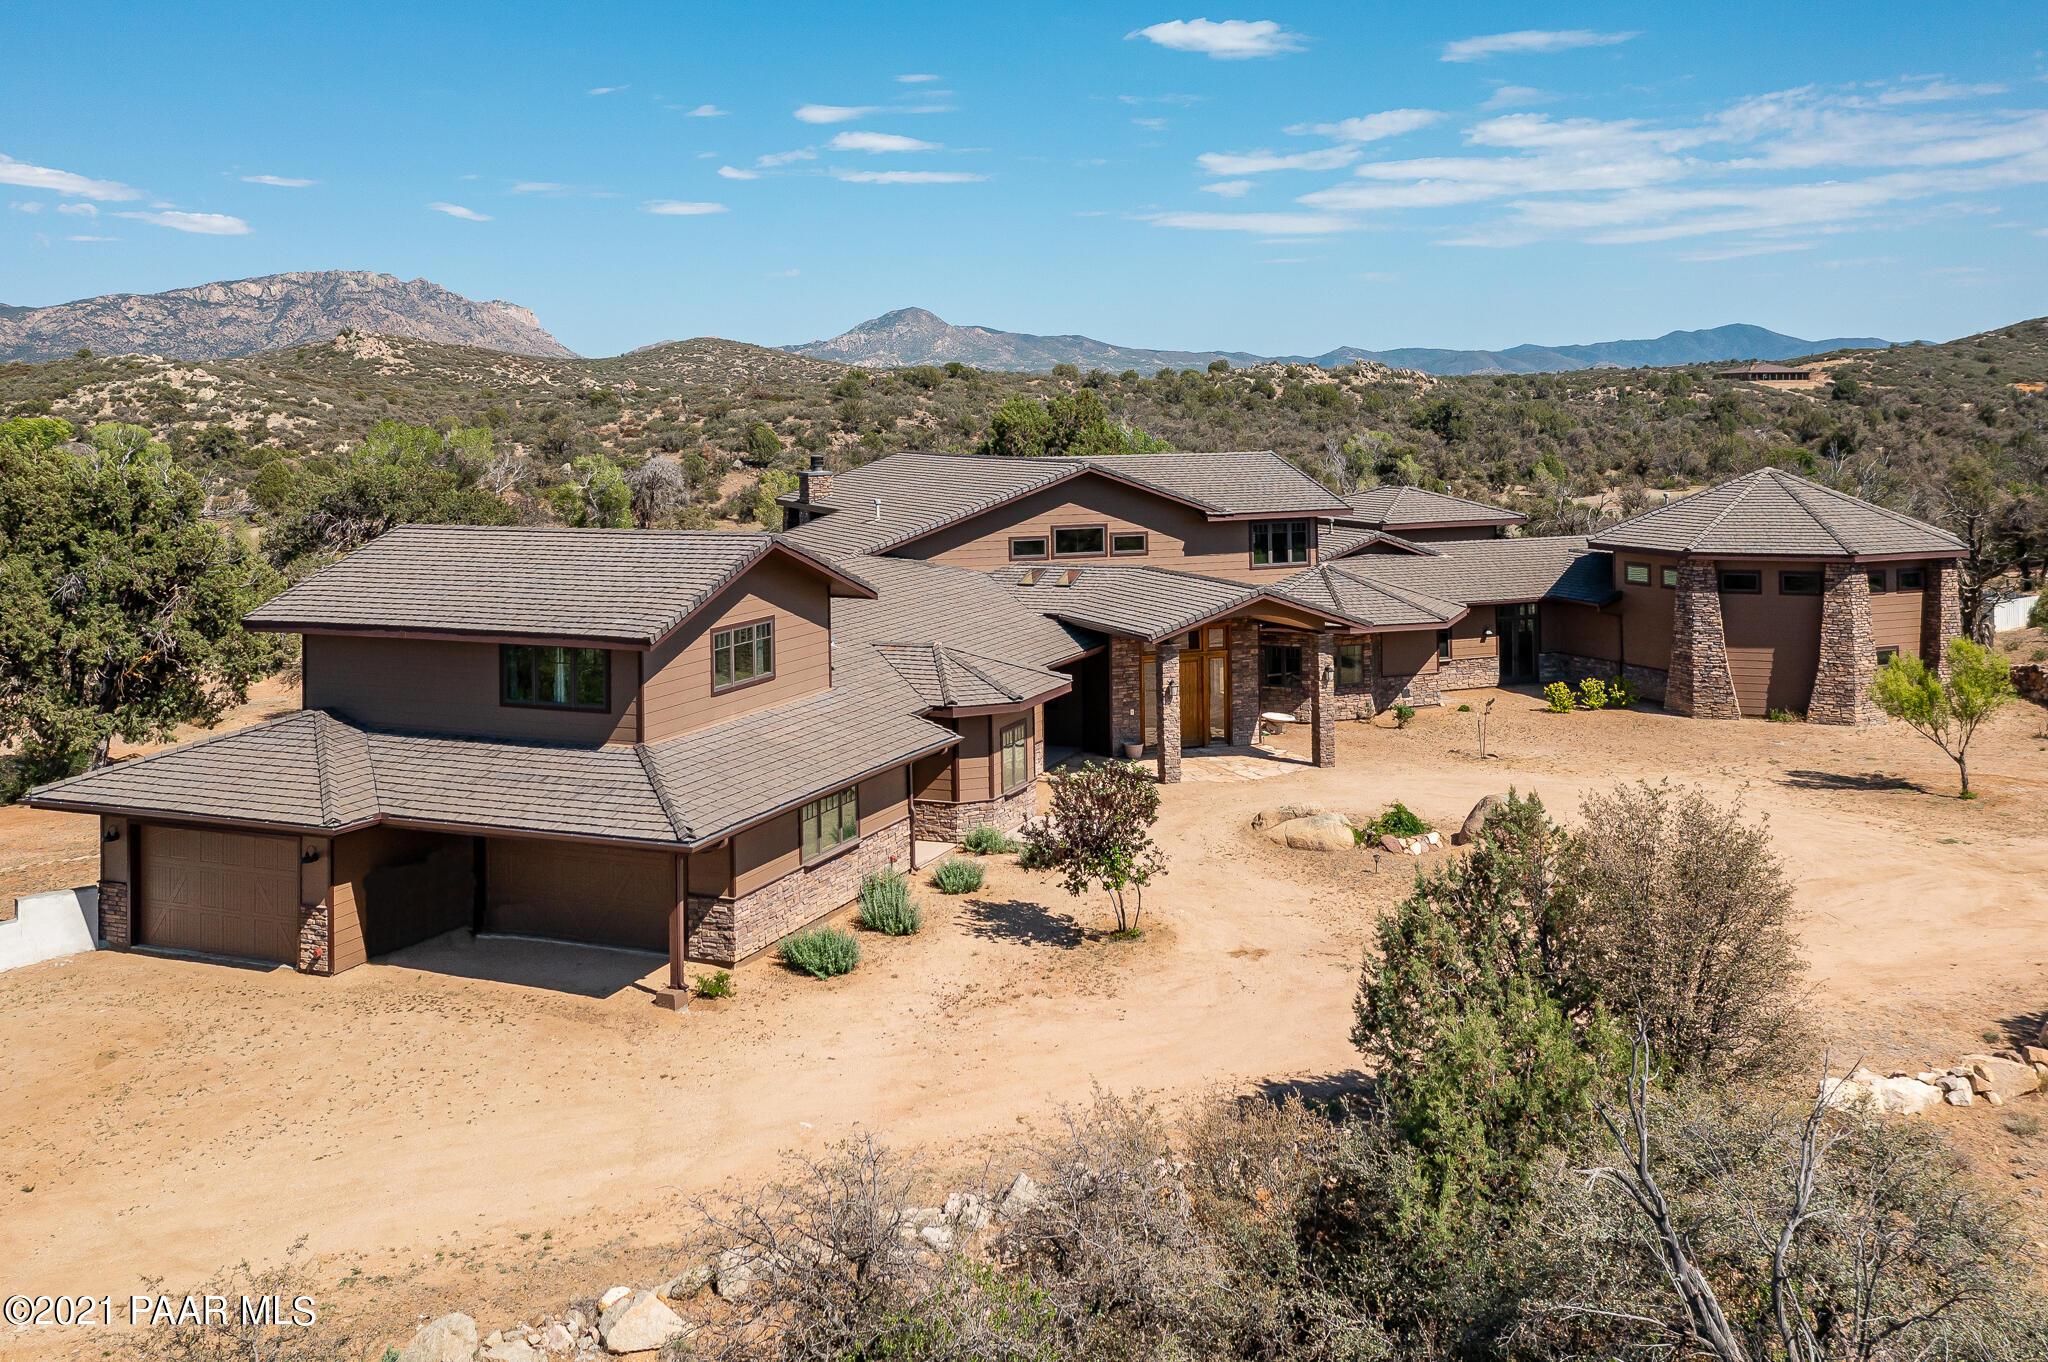 Photo of 8601 Calle Diamante, Skull Valley, AZ 86338